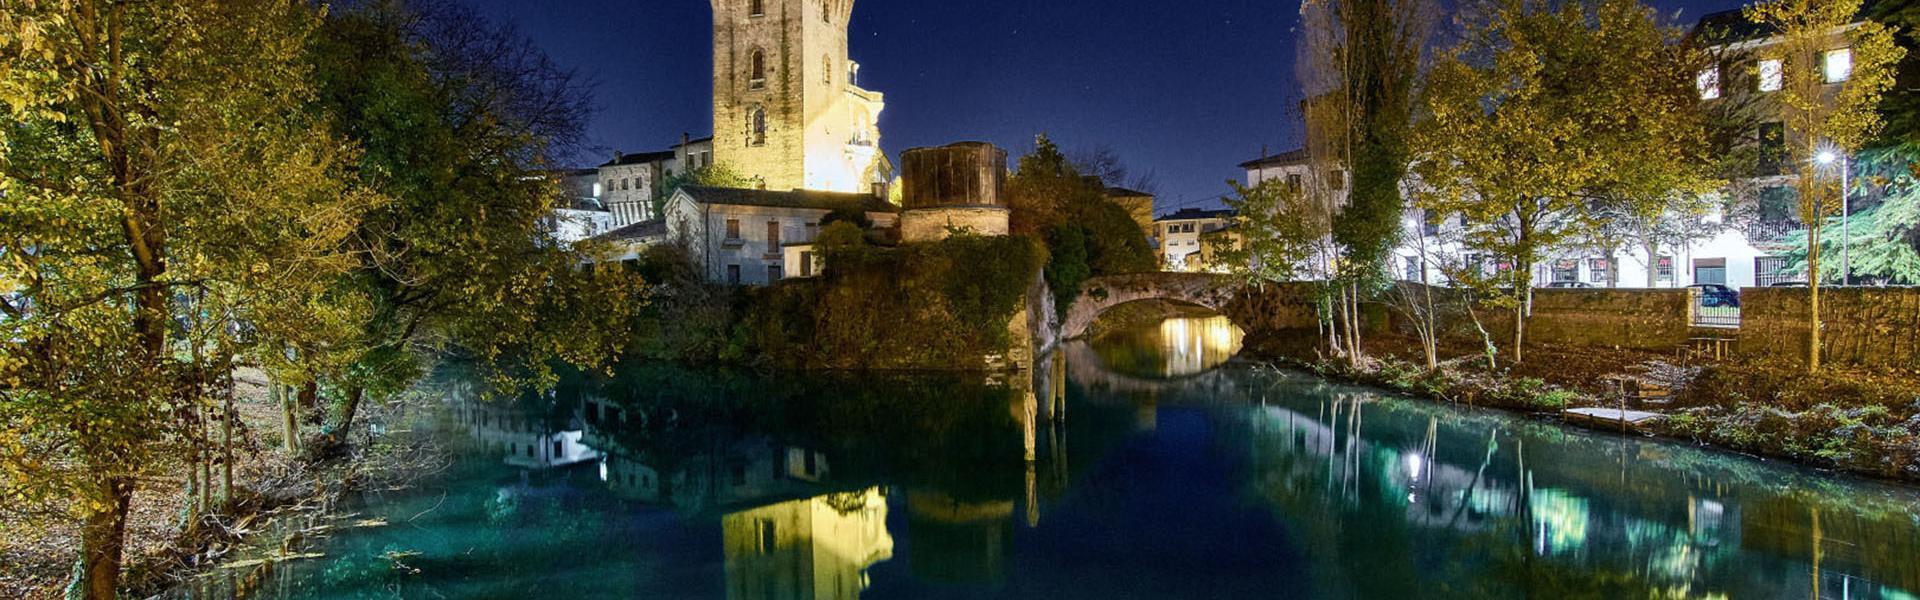 Padova Travel Vie d'acqua ©Tommaso Ongarello